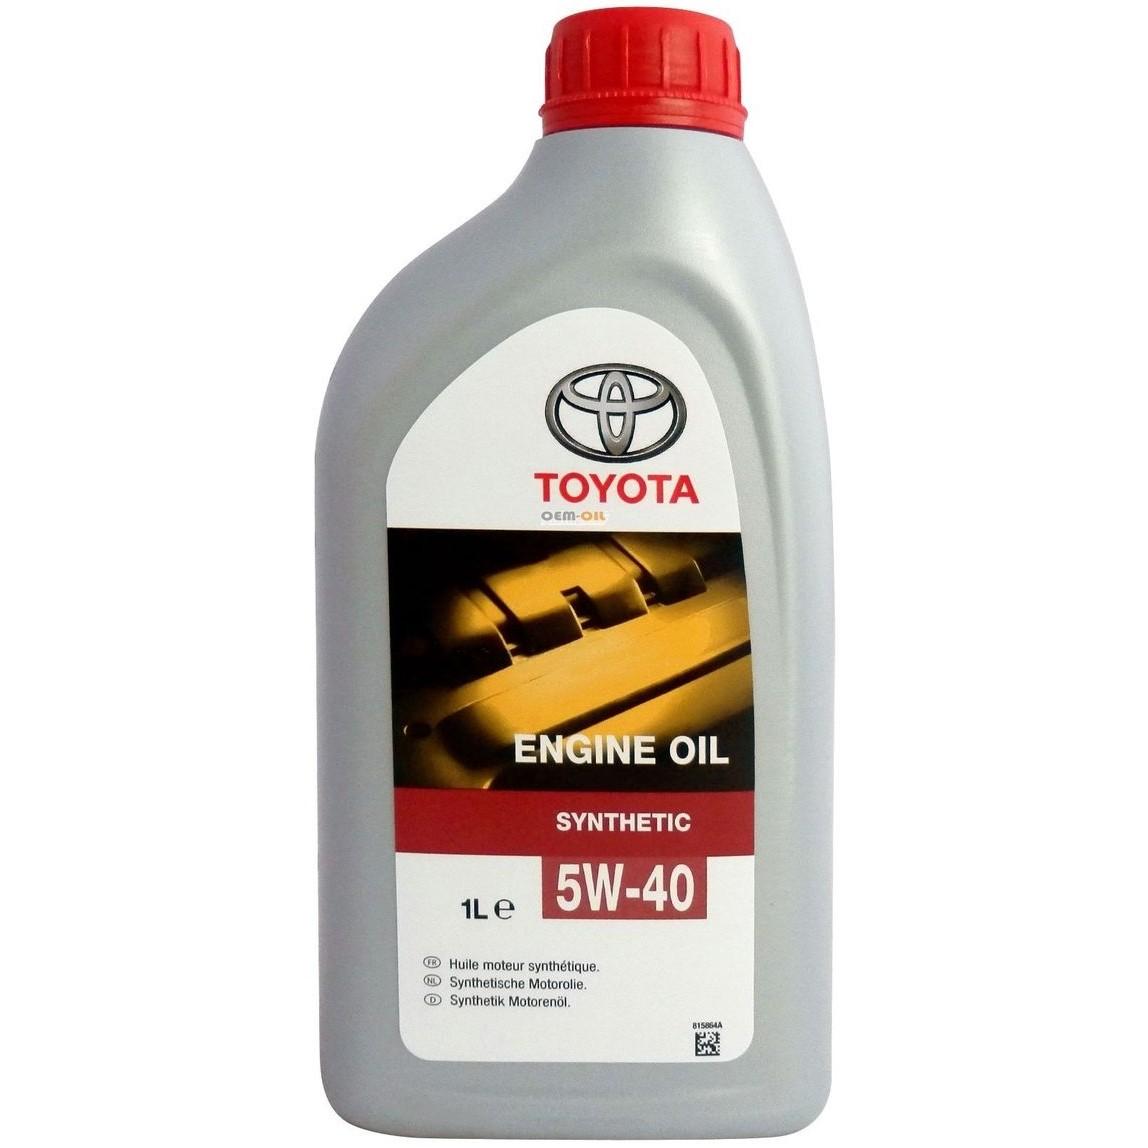 Масло моторное Синтетическое 1л - TOYOTA ENGINE OIL Synthetic 5W-40